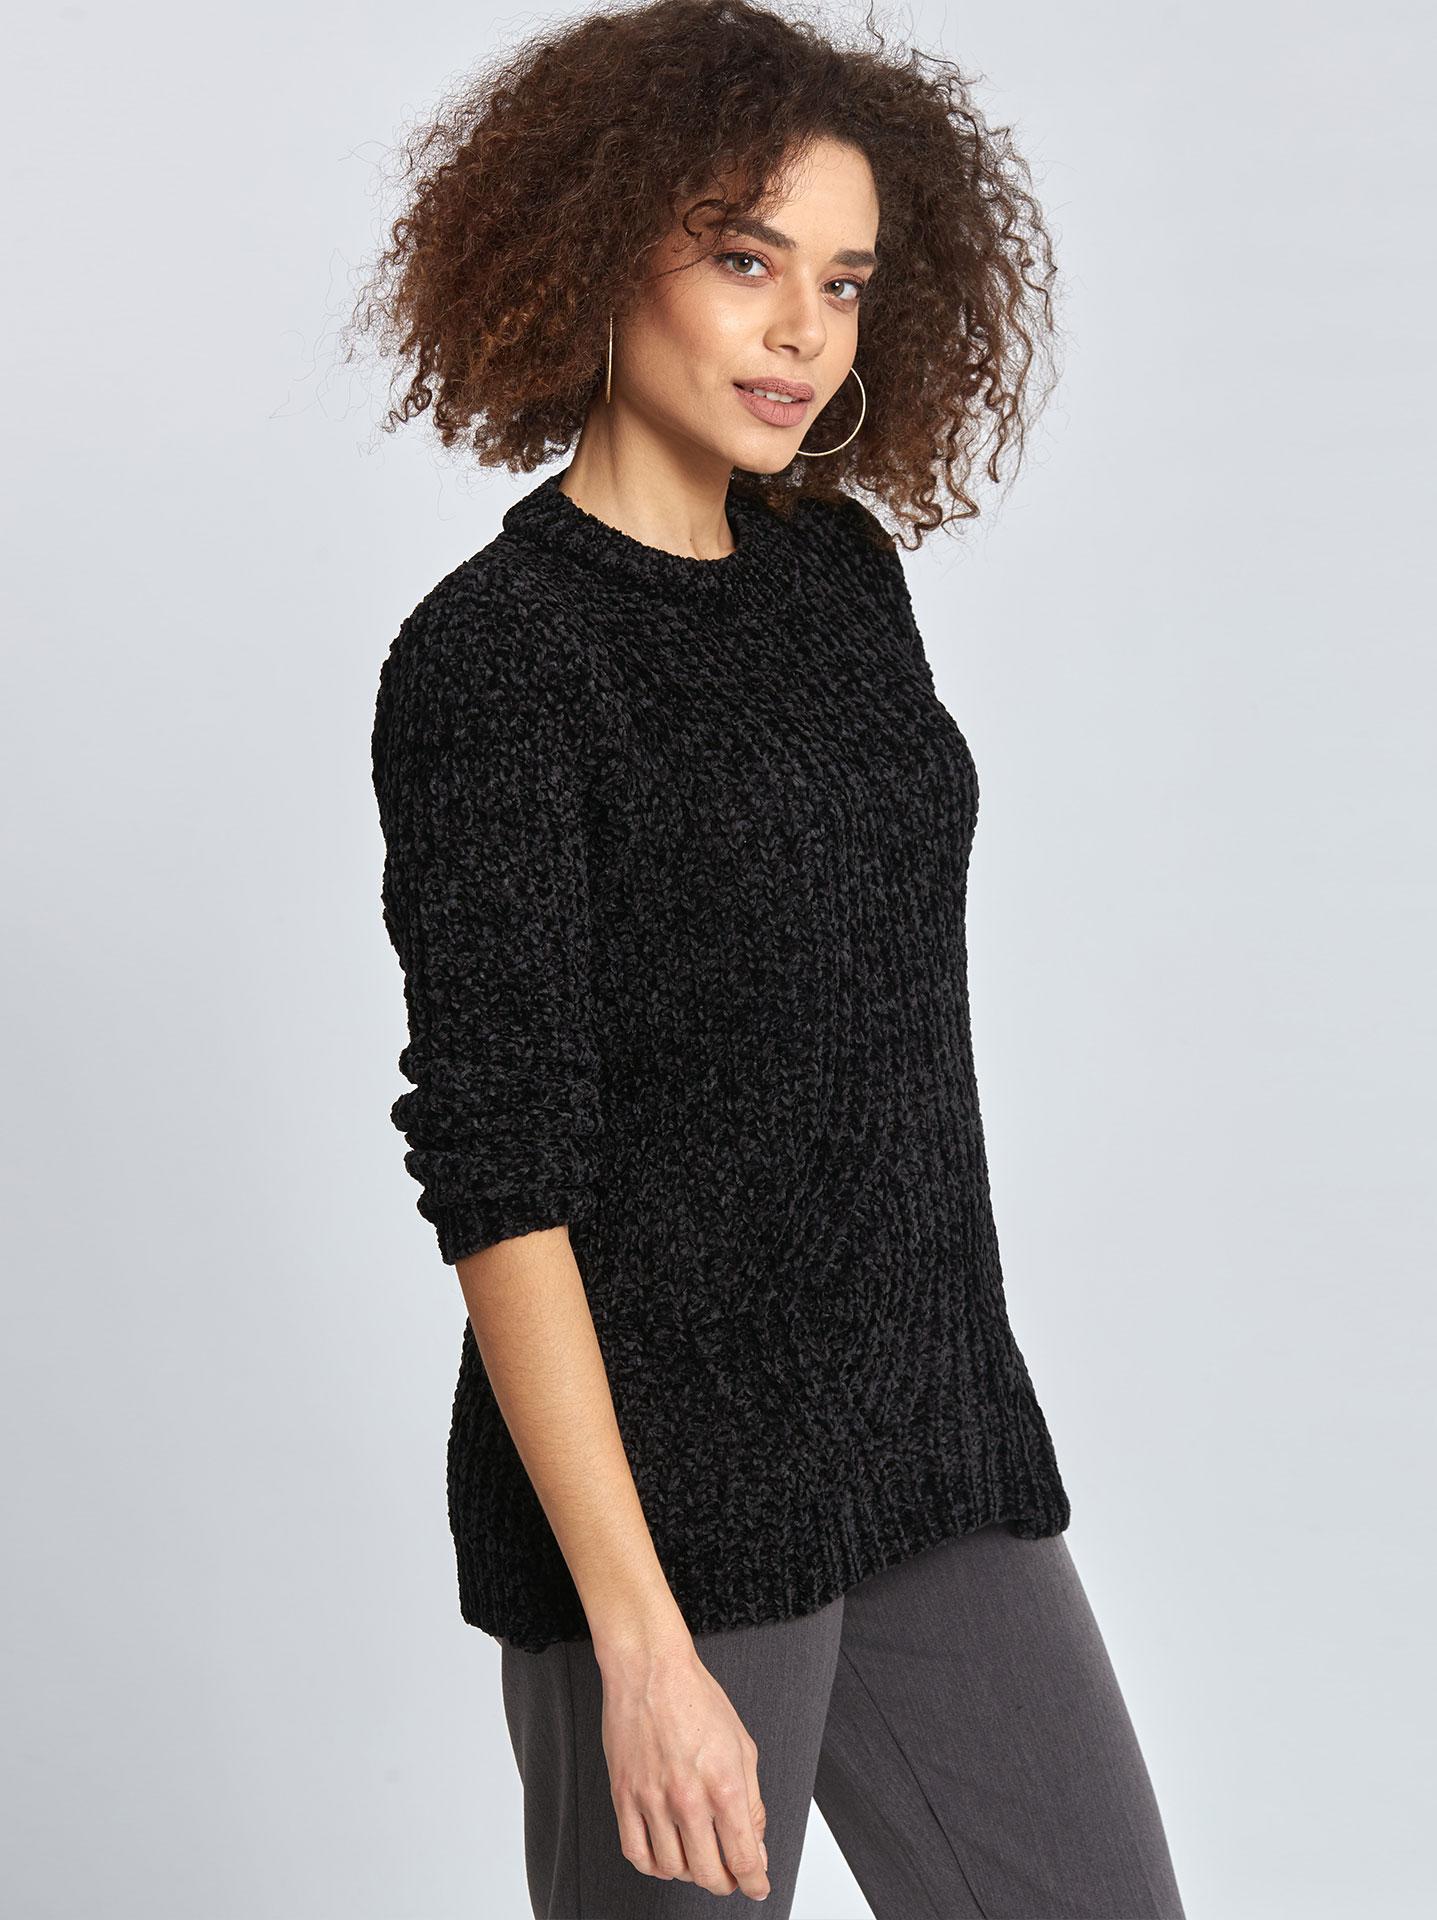 441cbe37b20d Γυναικεία Ρούχα Πλεκτά-Ζακέτες Chenille πουλόβερ με σχέδιο WL1627.9825+4